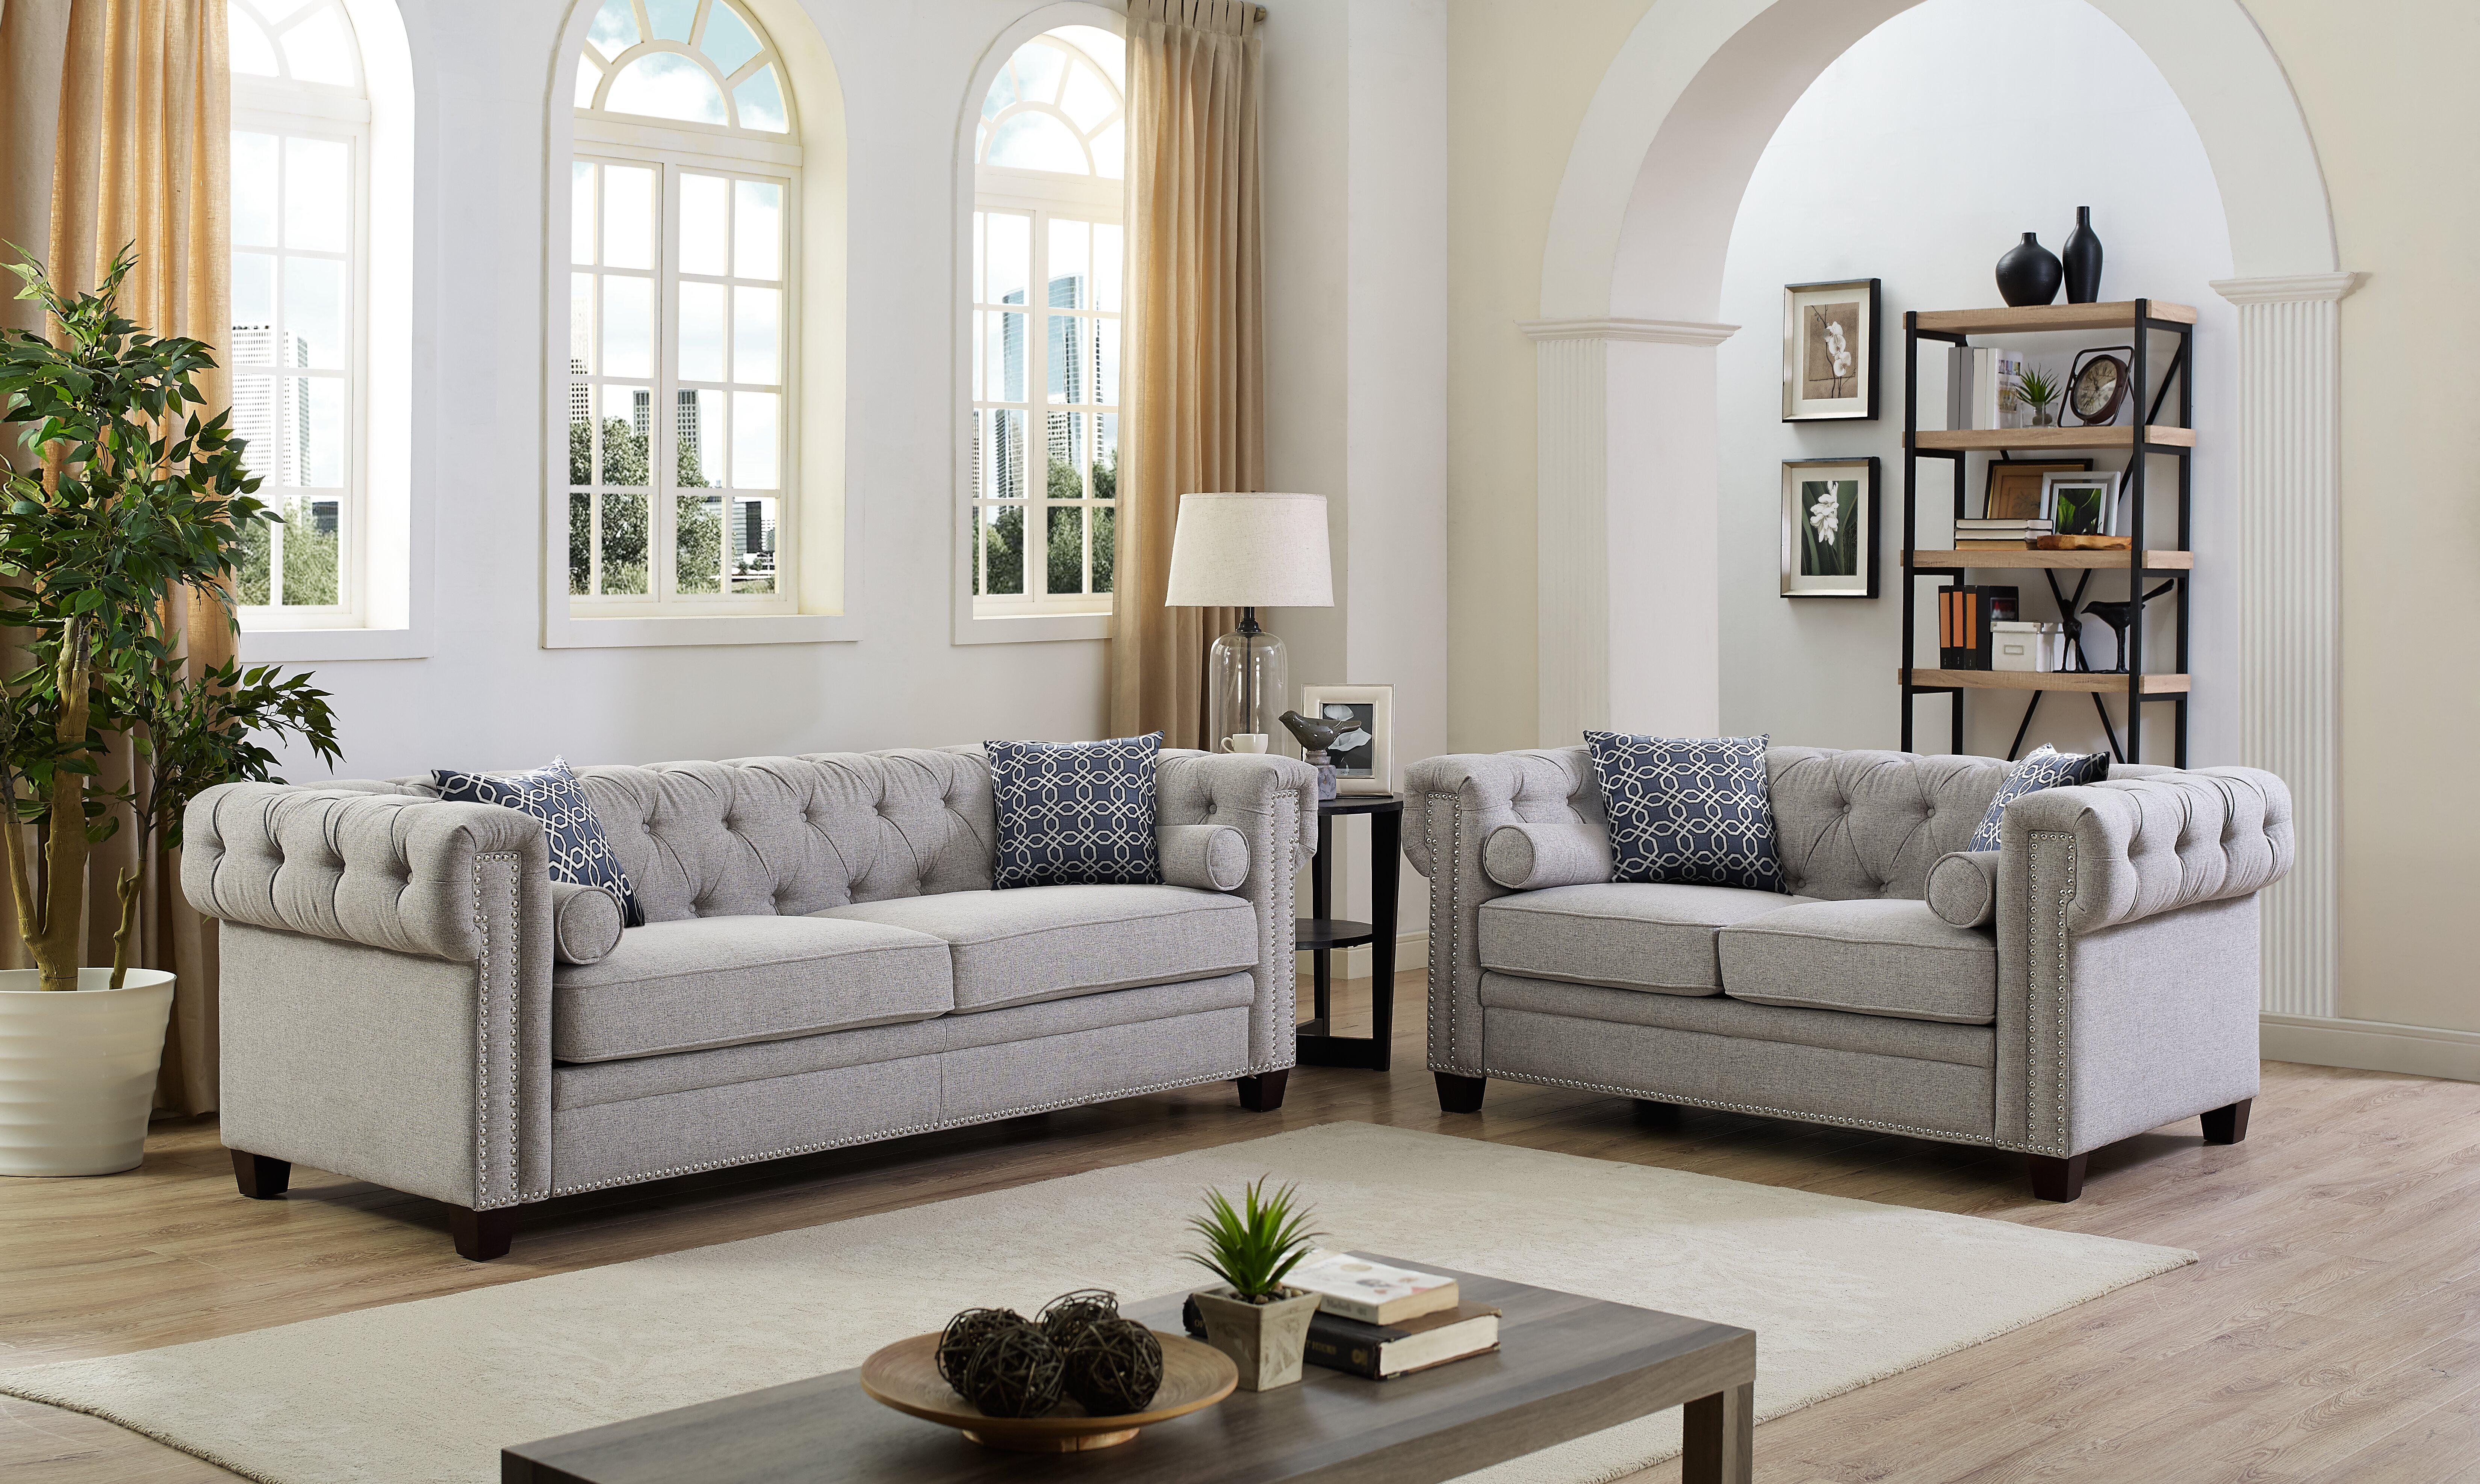 Brockton 2 Piece Living Room Set